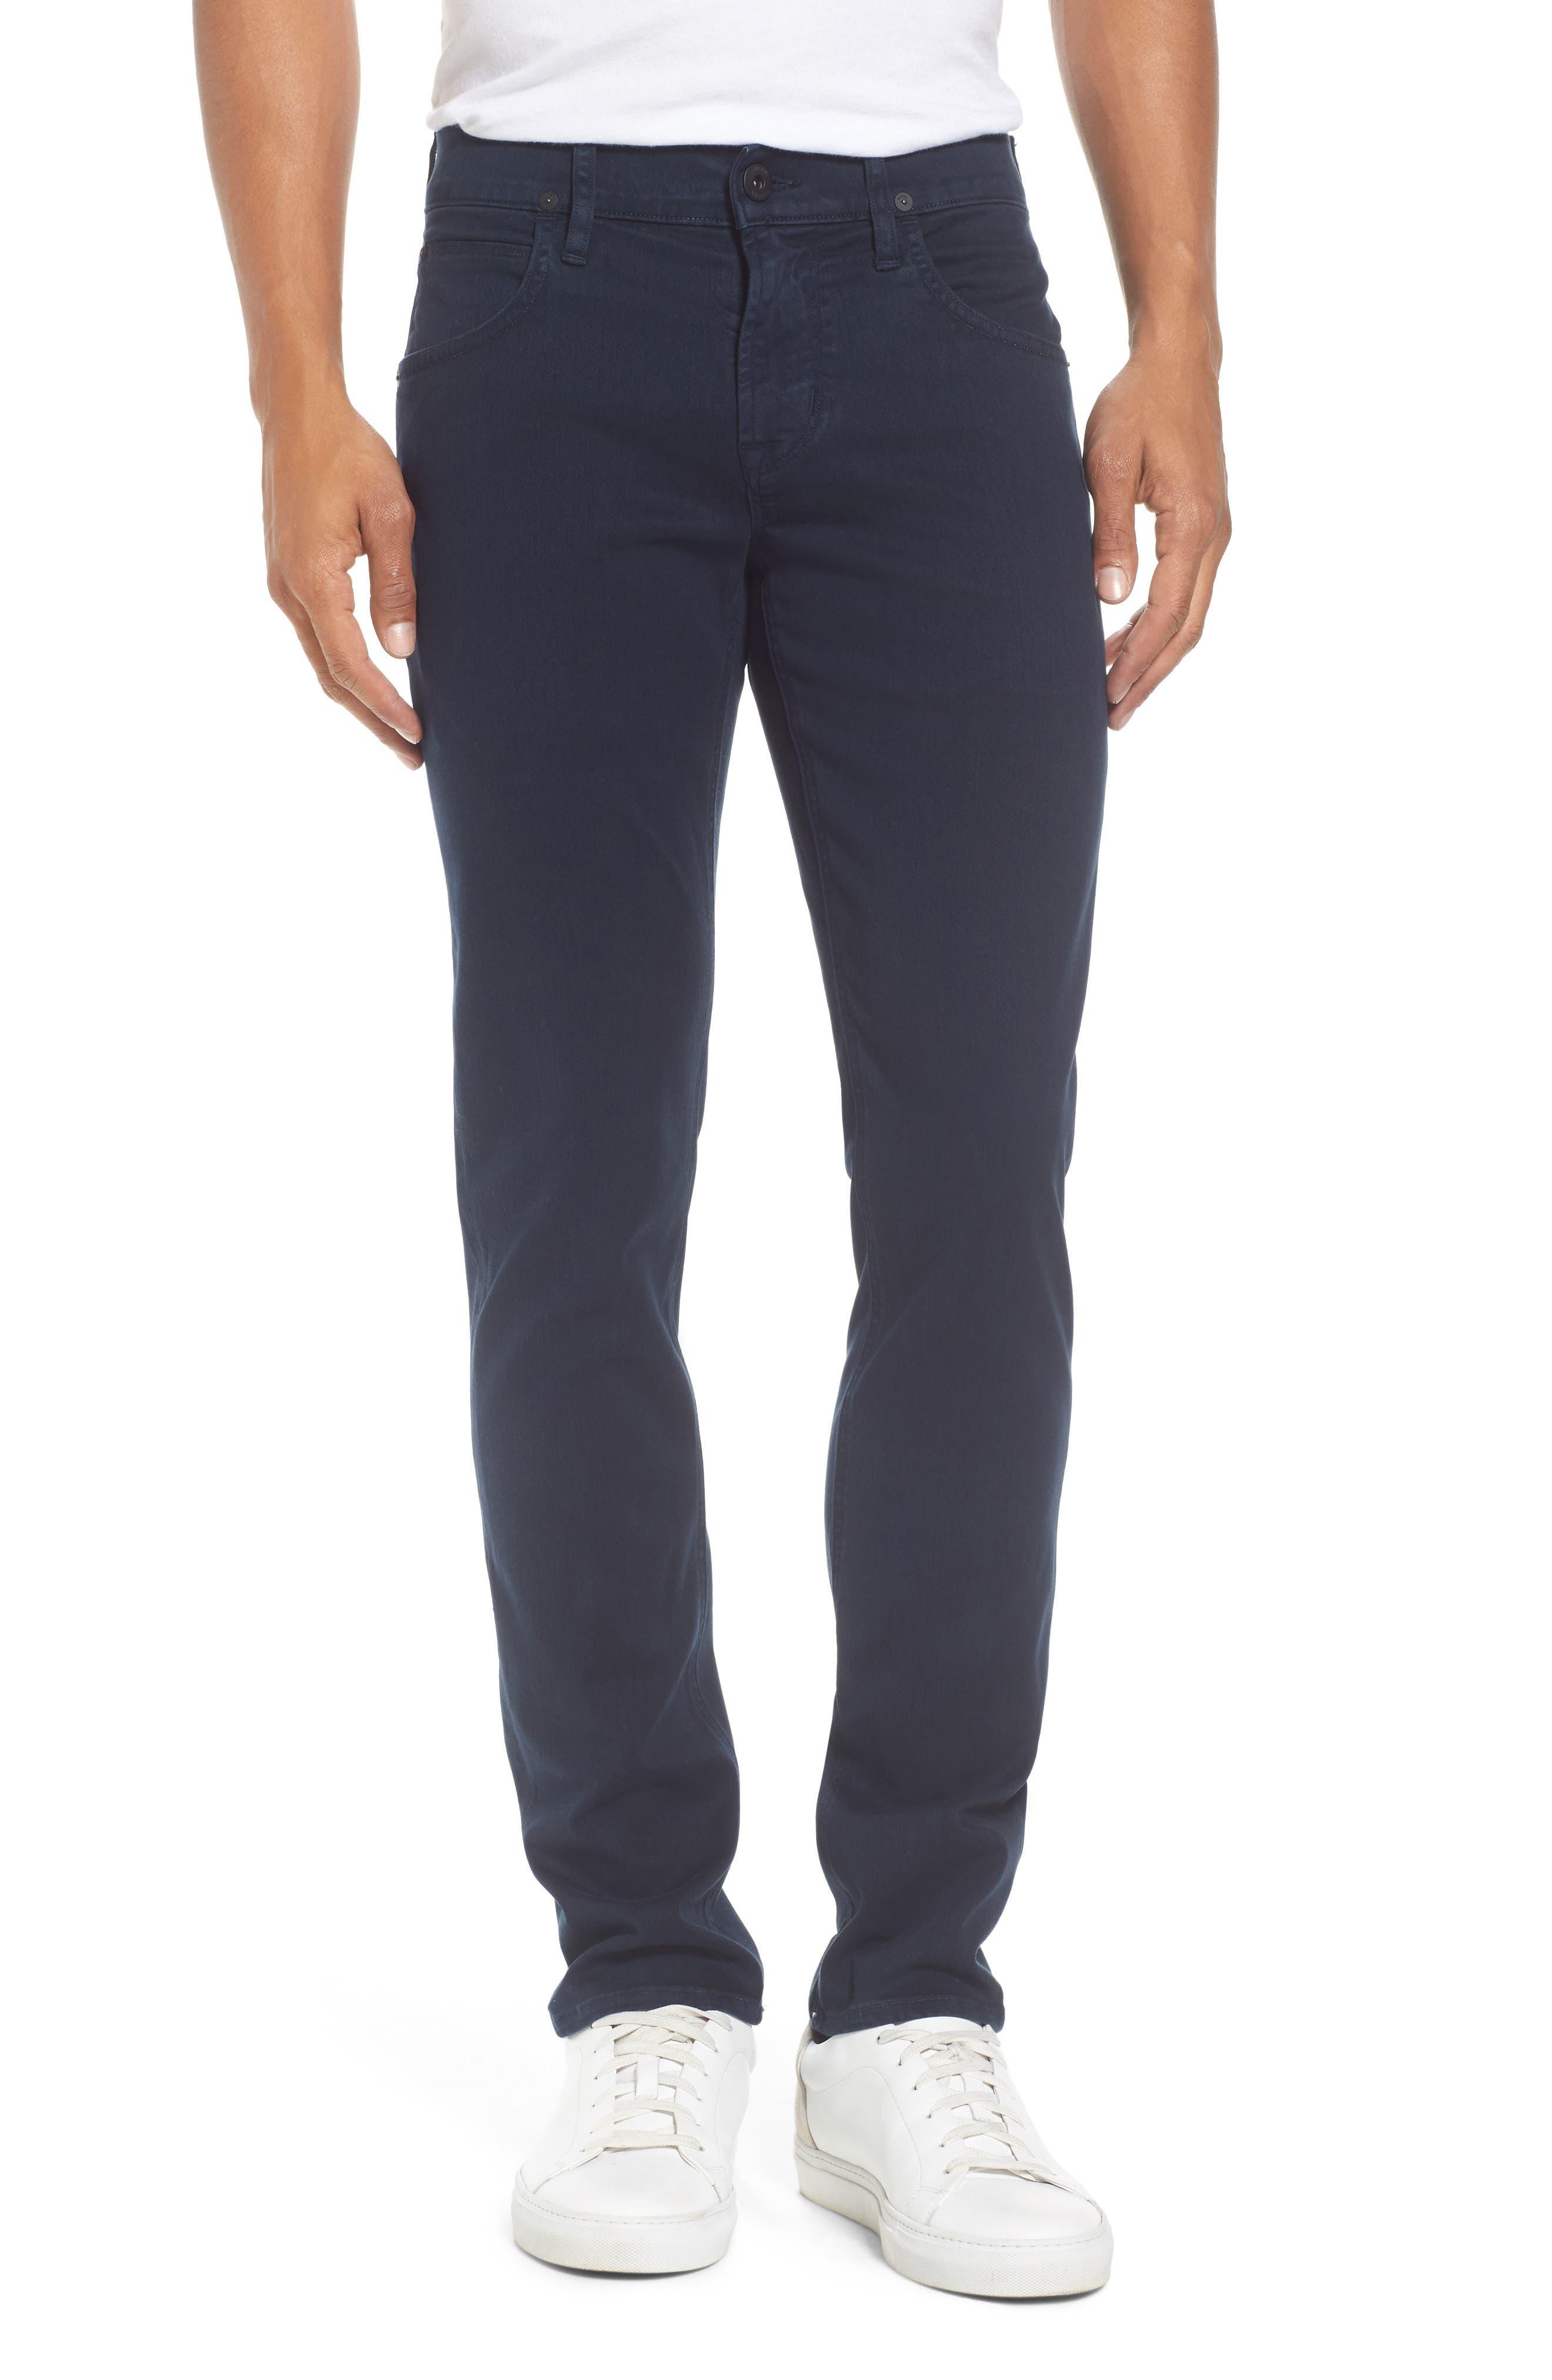 Blake Slim Fit Jeans,                         Main,                         color, POLAR